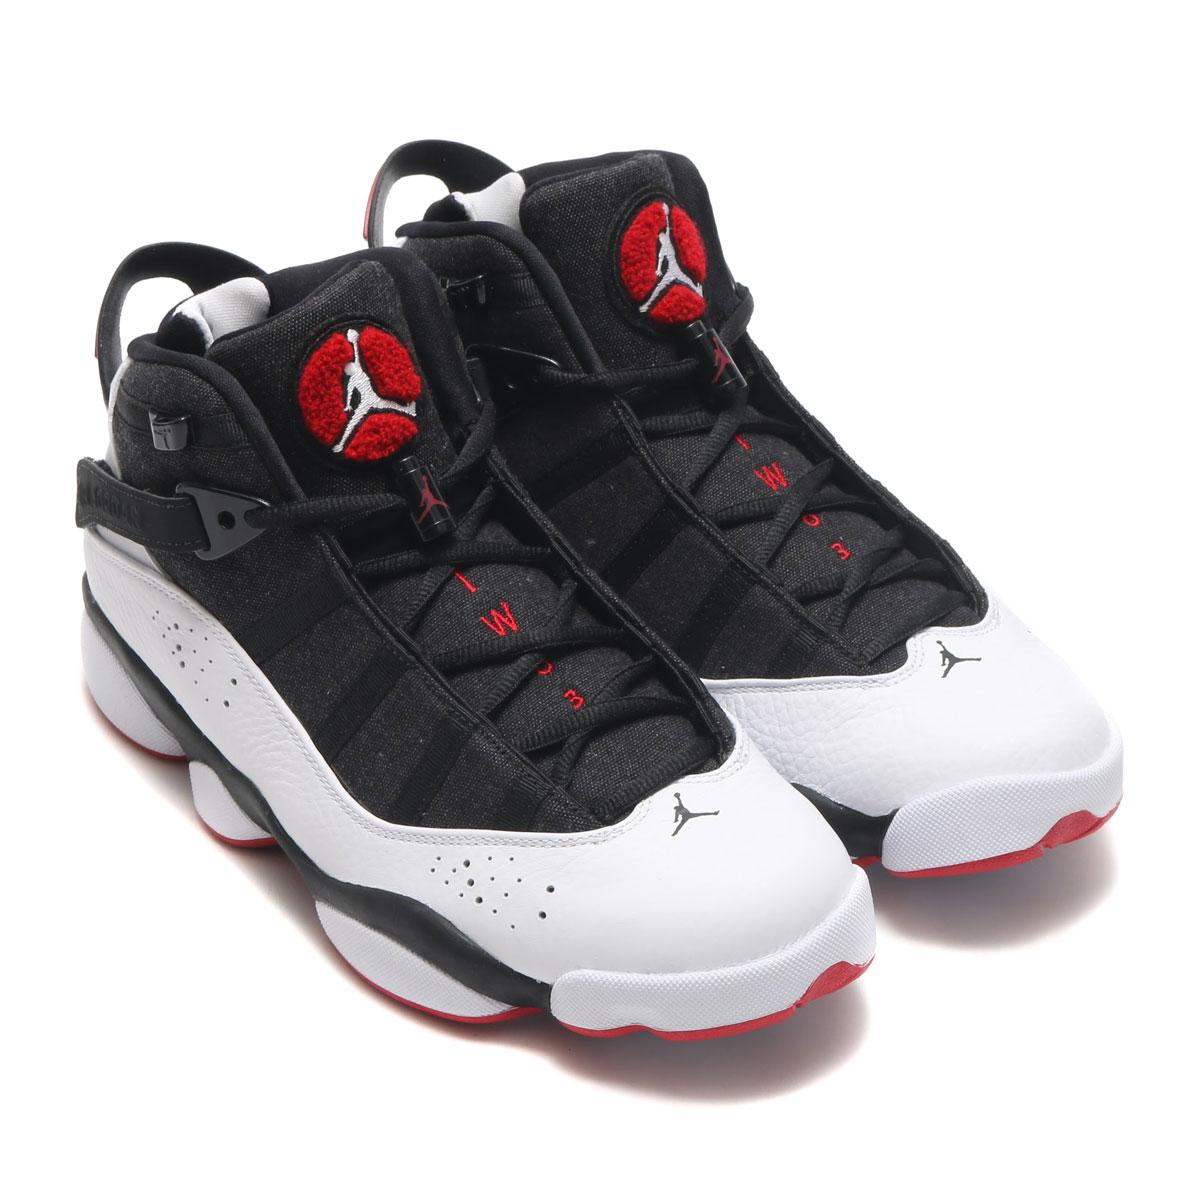 477e236baa5 Running Jordan Nike Mens 6 Rings Basketball Shoe Chaussures et Sacs